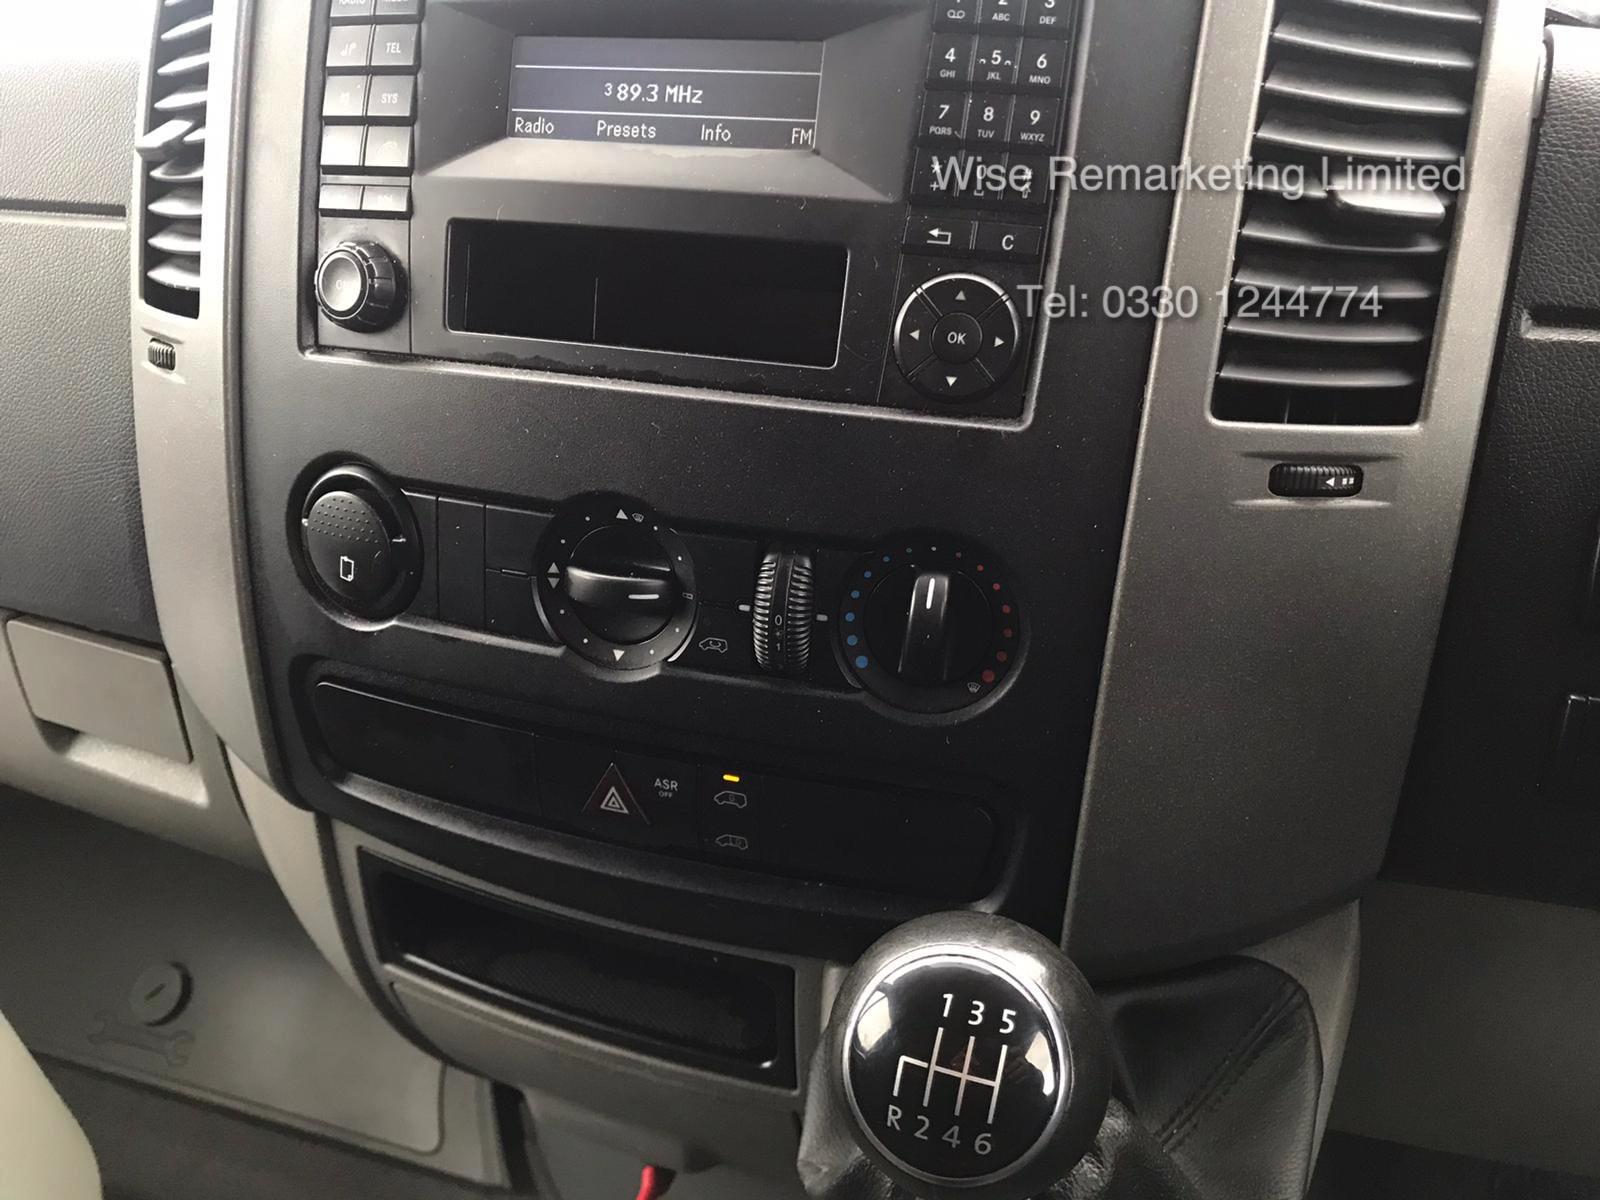 Lot 18 - Volkswagen Crafter CR35 Startline 2.0l TDi - LWB - 2016 Model -1 Keeper From New - Service History